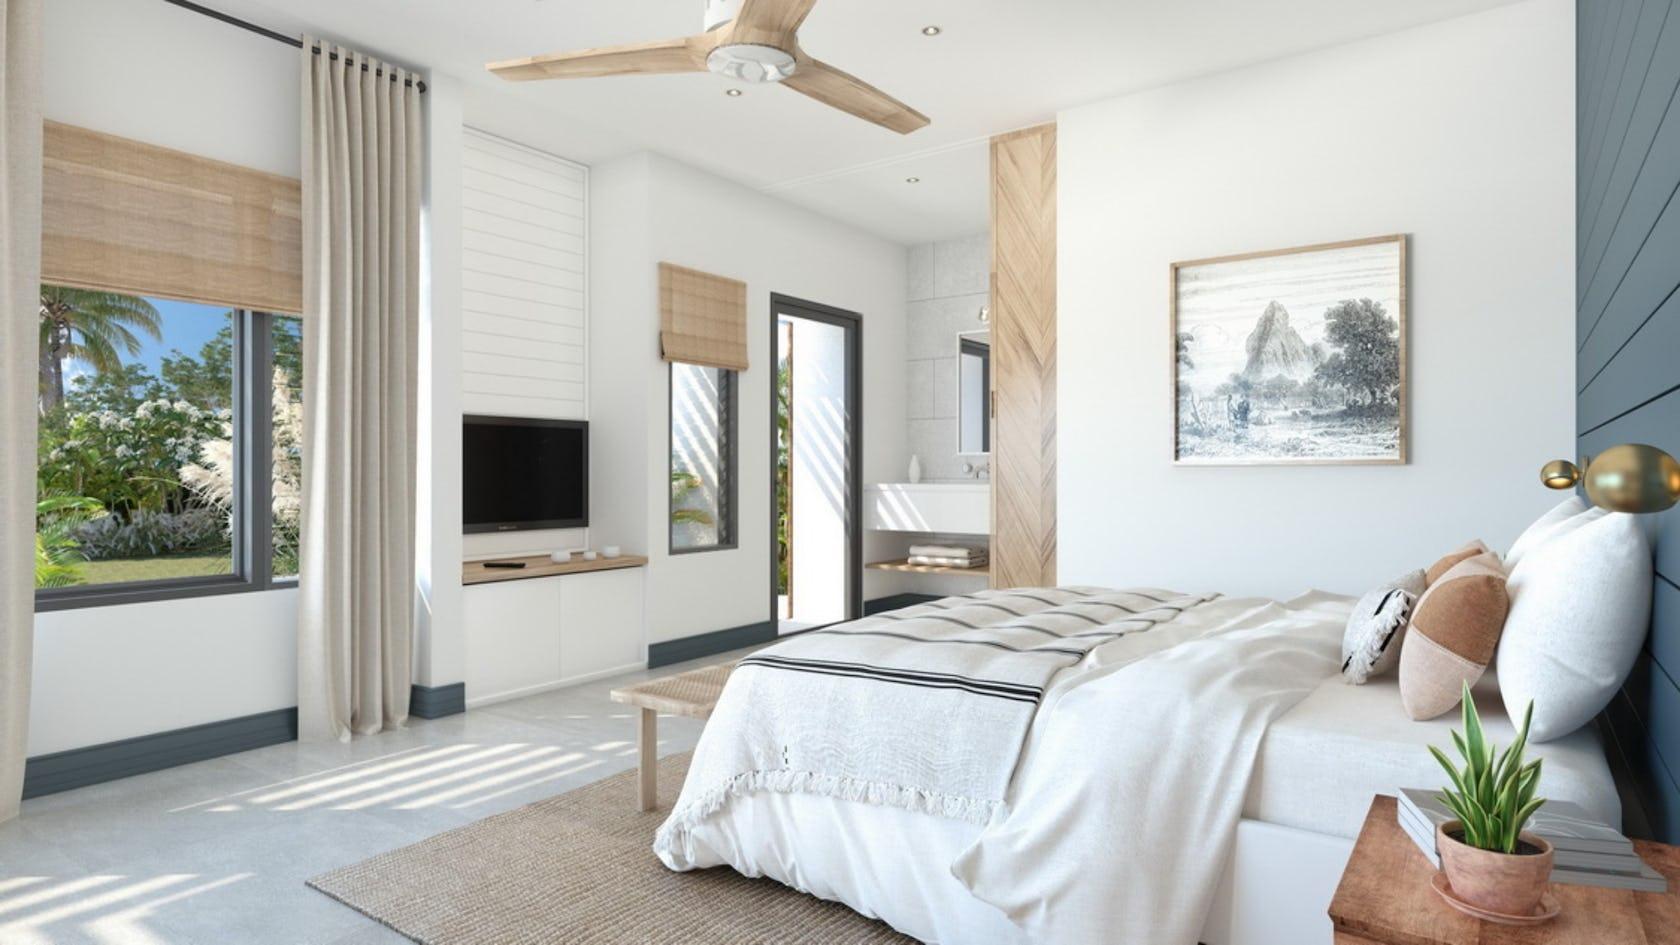 ceiling fan appliance bed furniture home decor bedroom indoors room